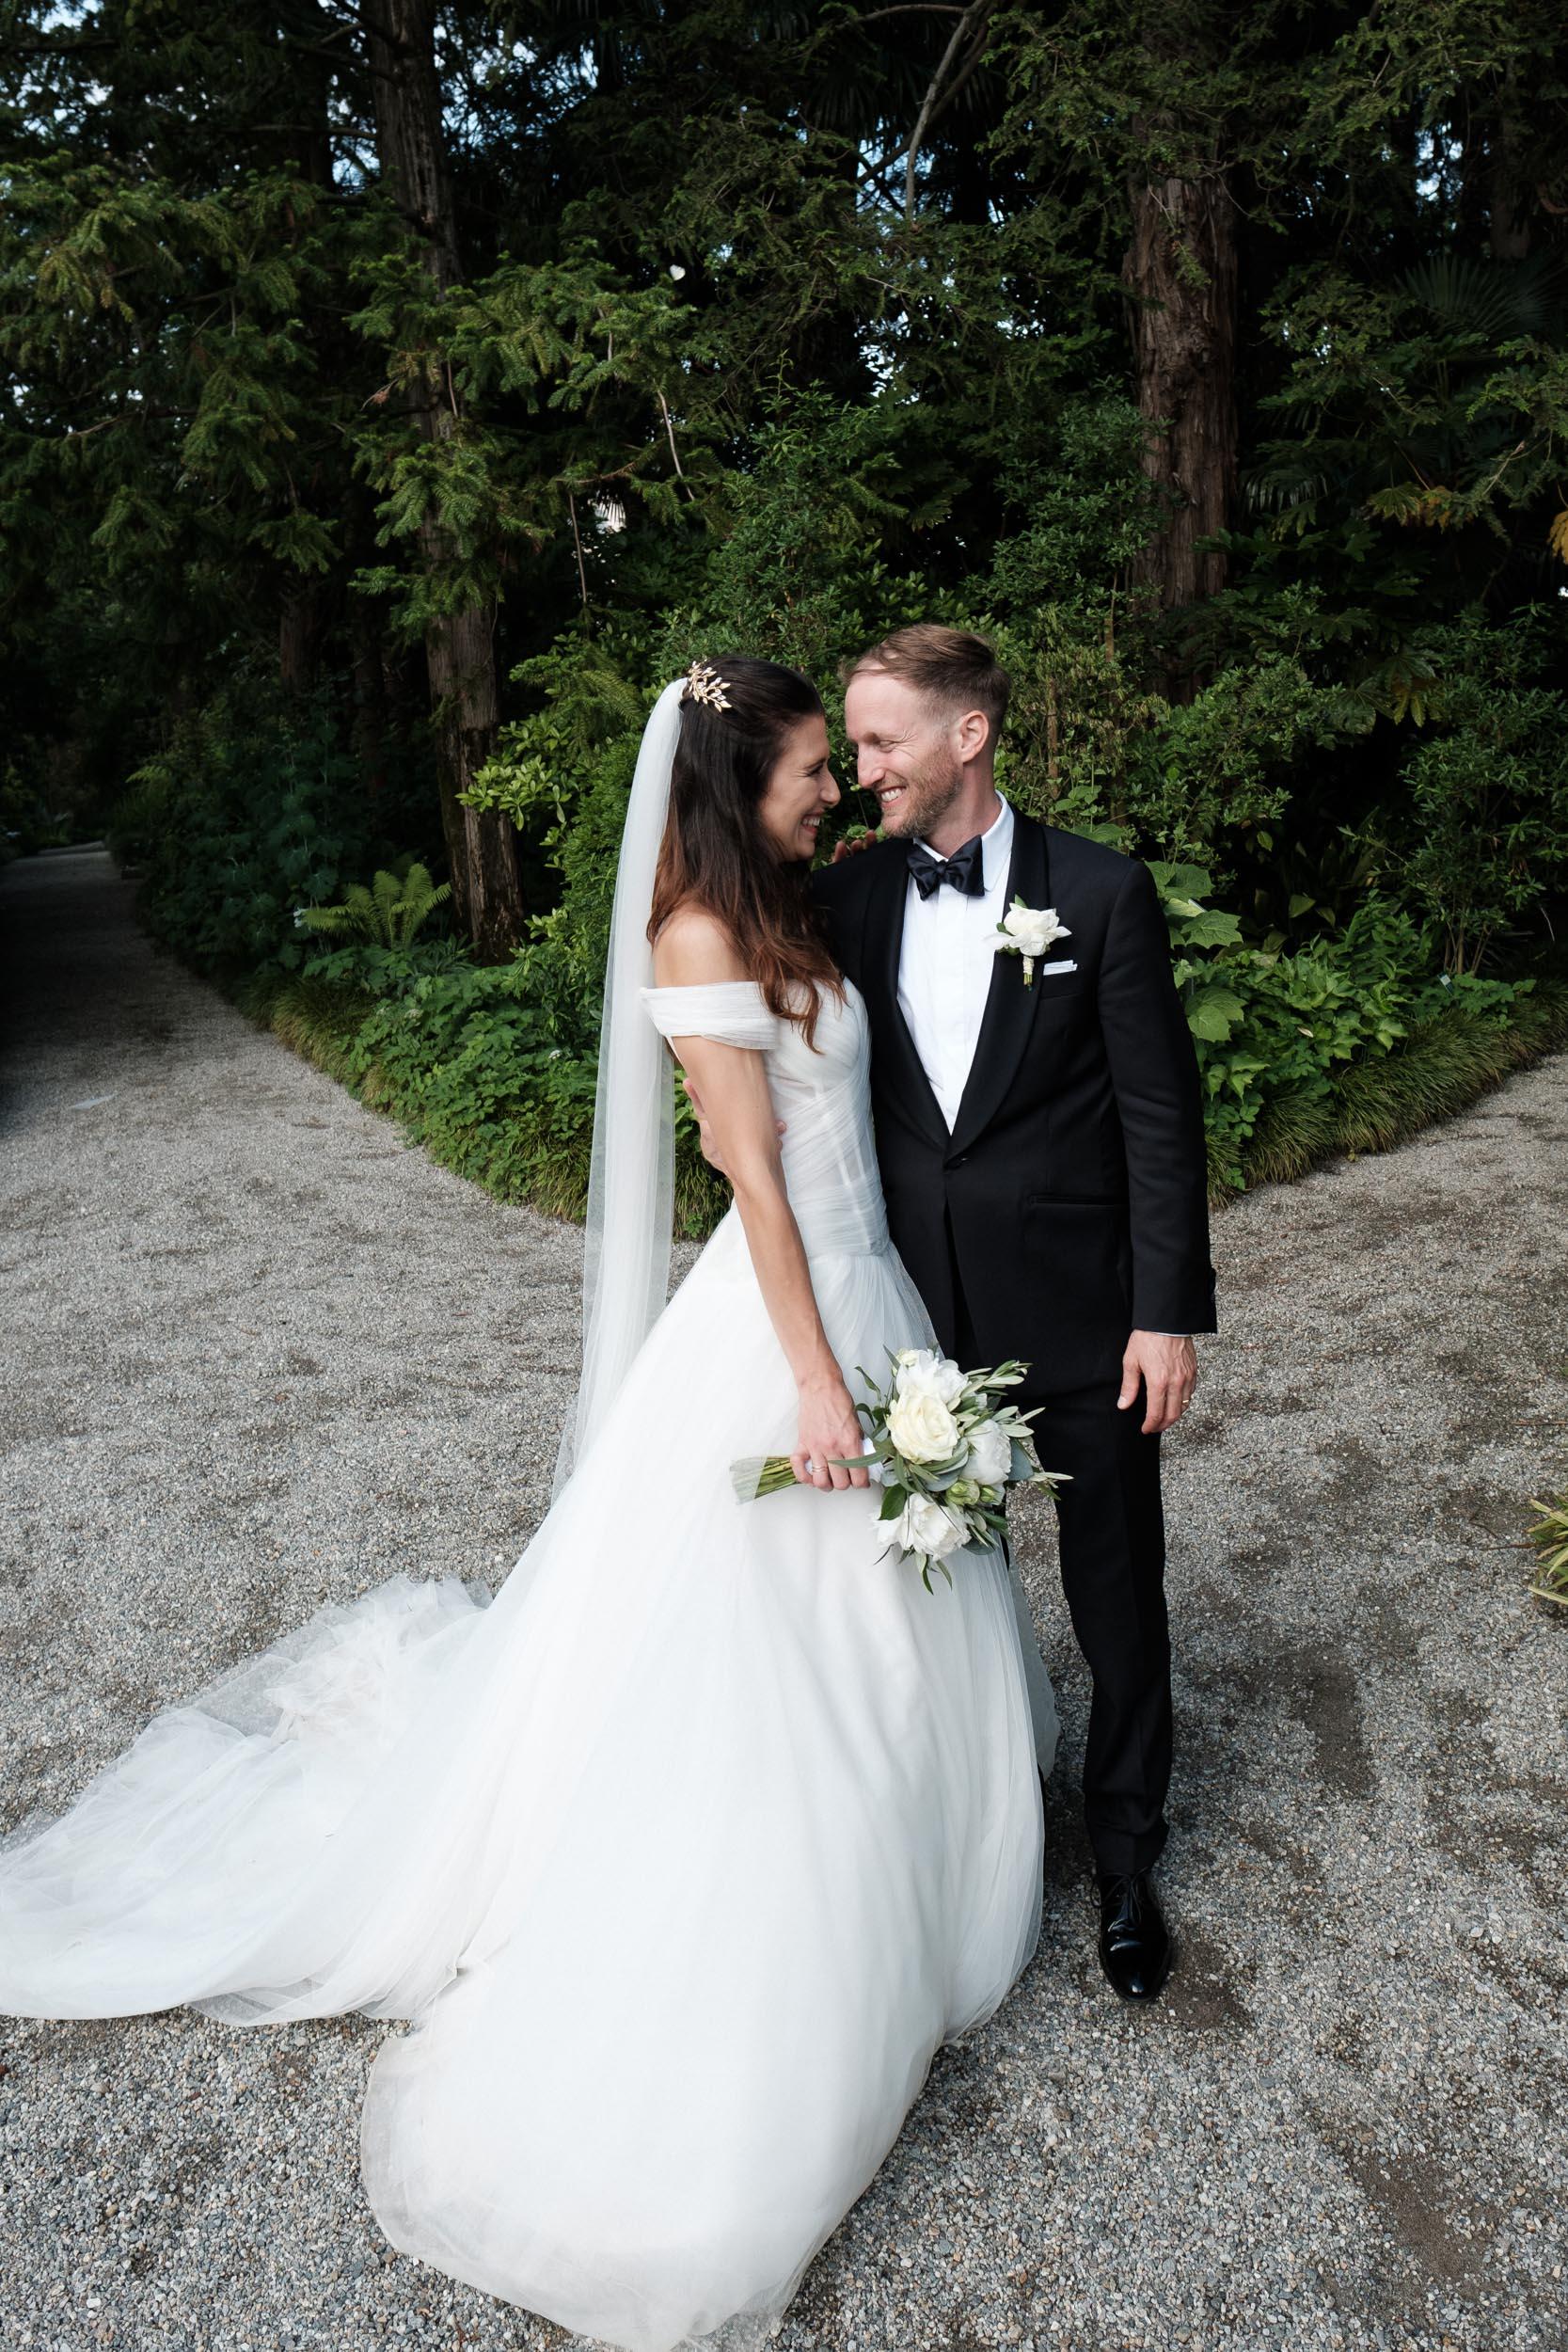 olivia-andreas-wedding-switzerland-391.jpg